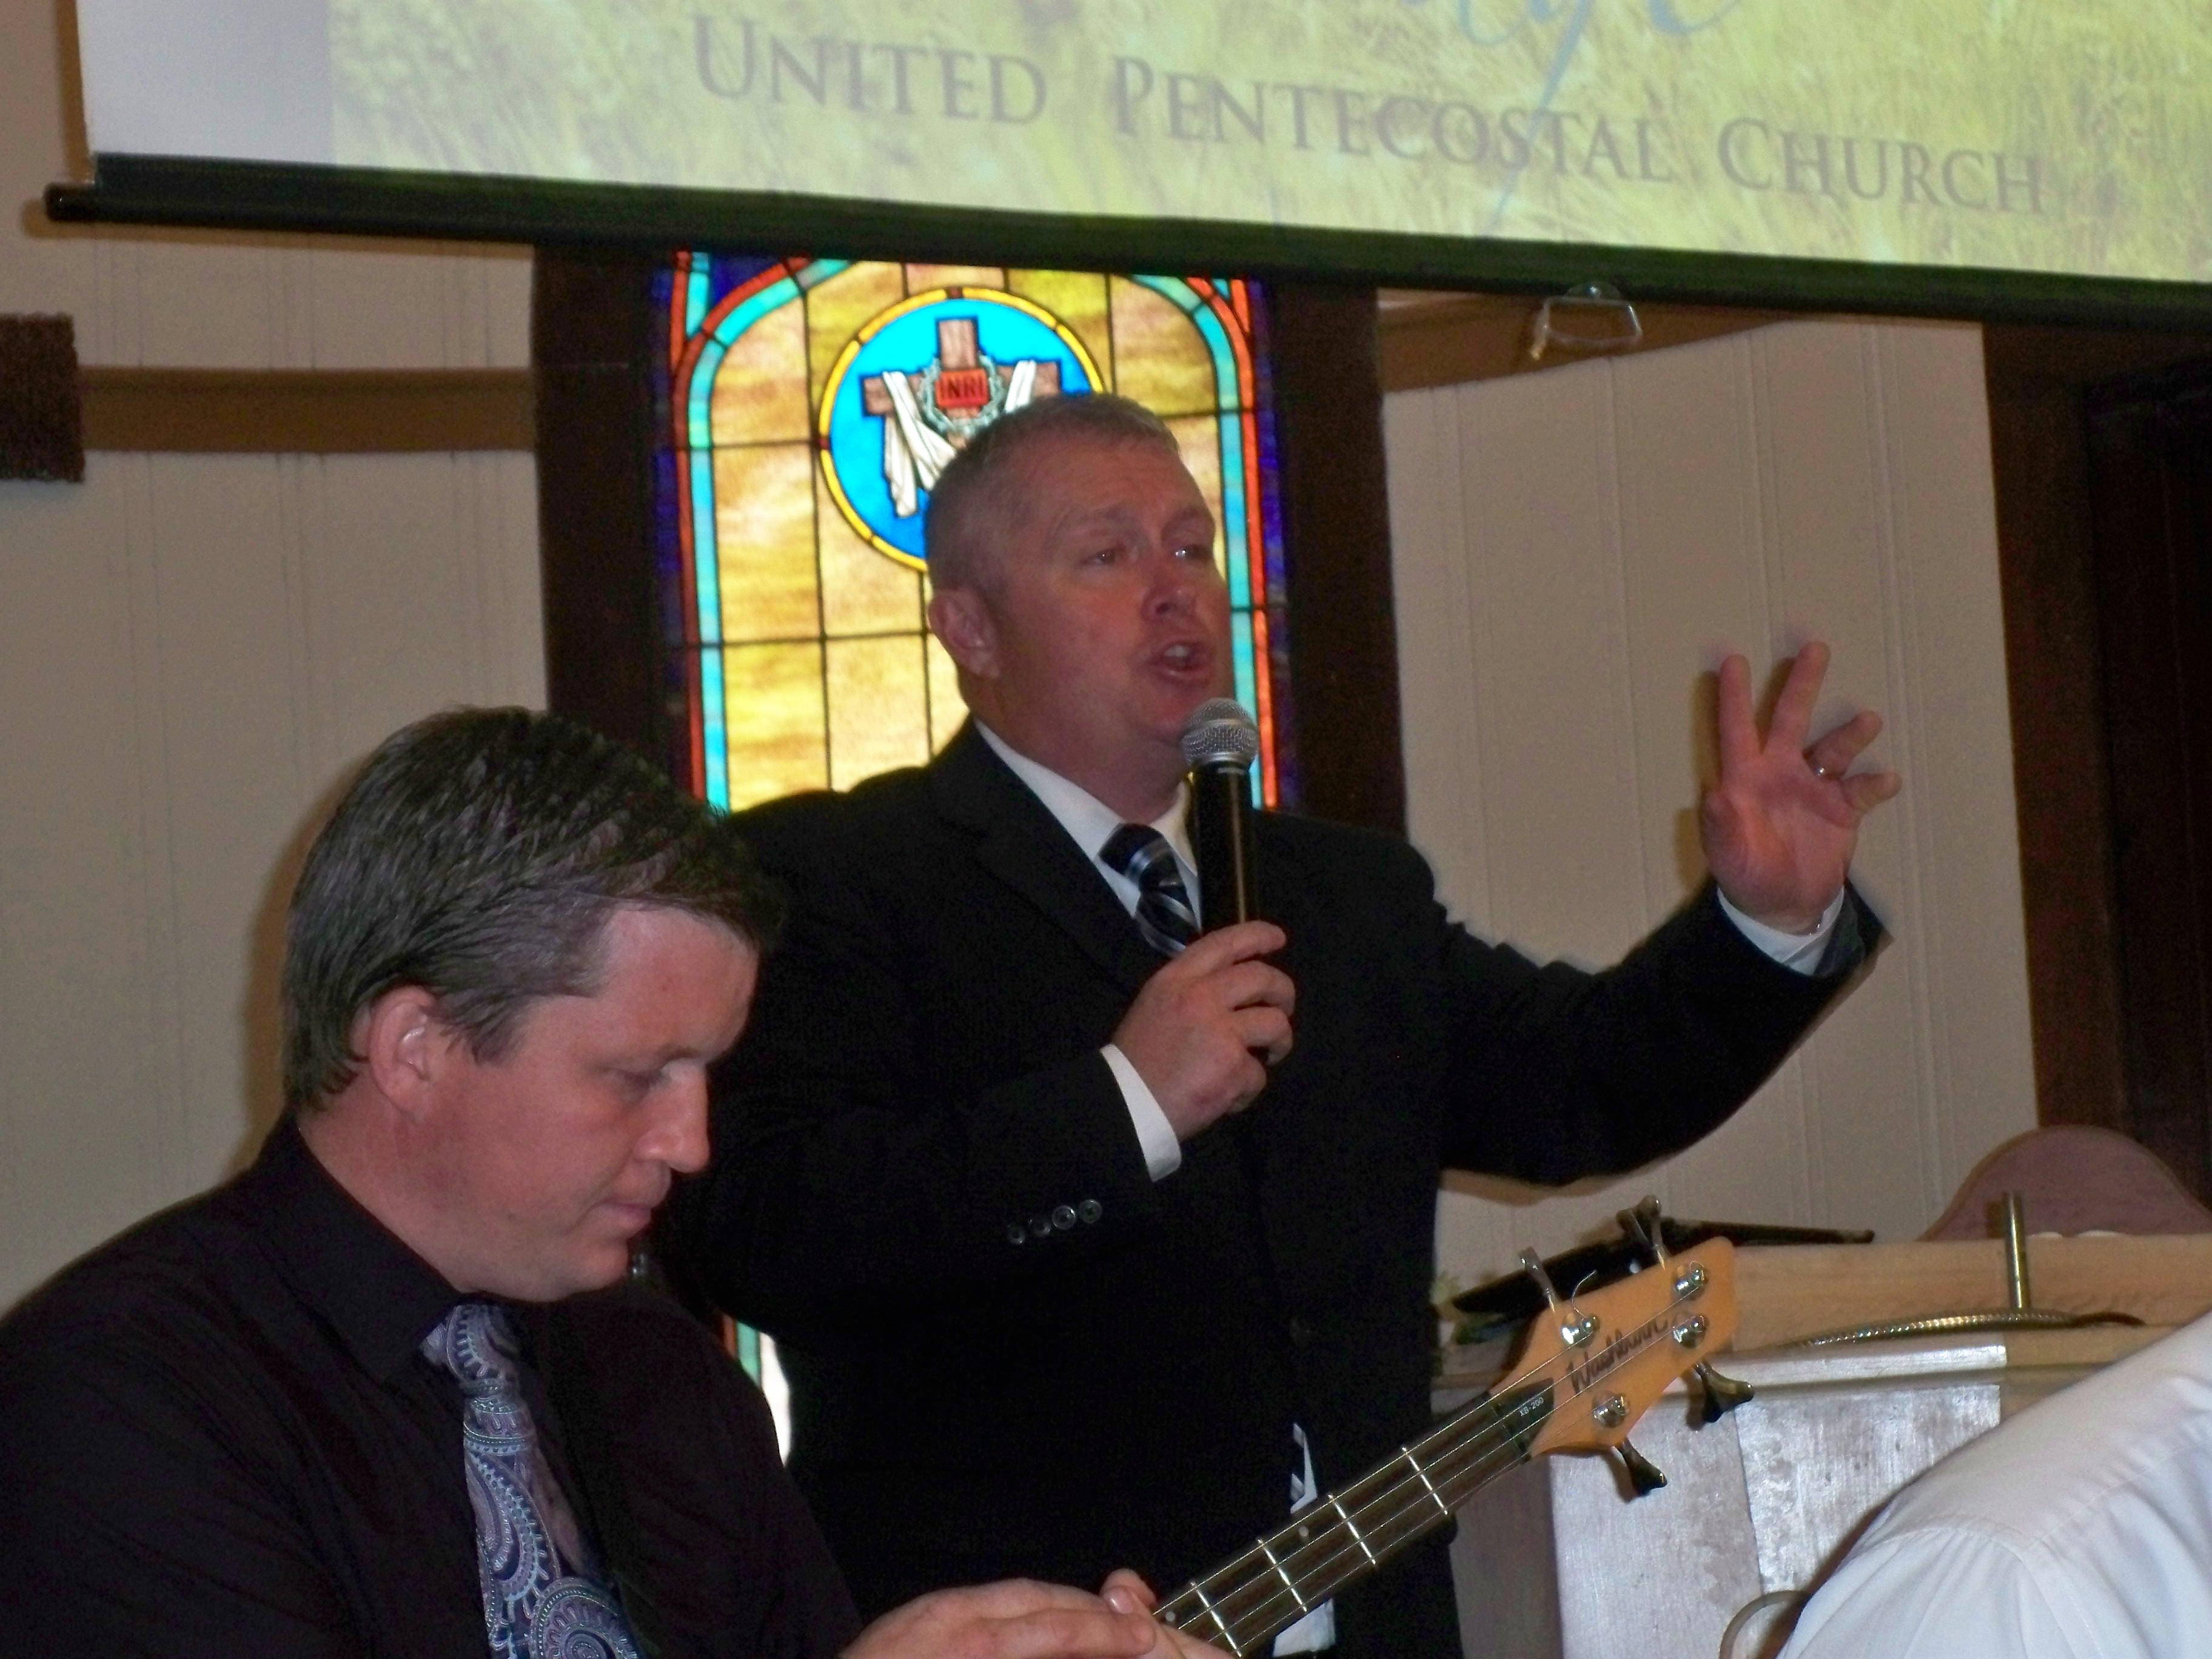 Pastor Willis